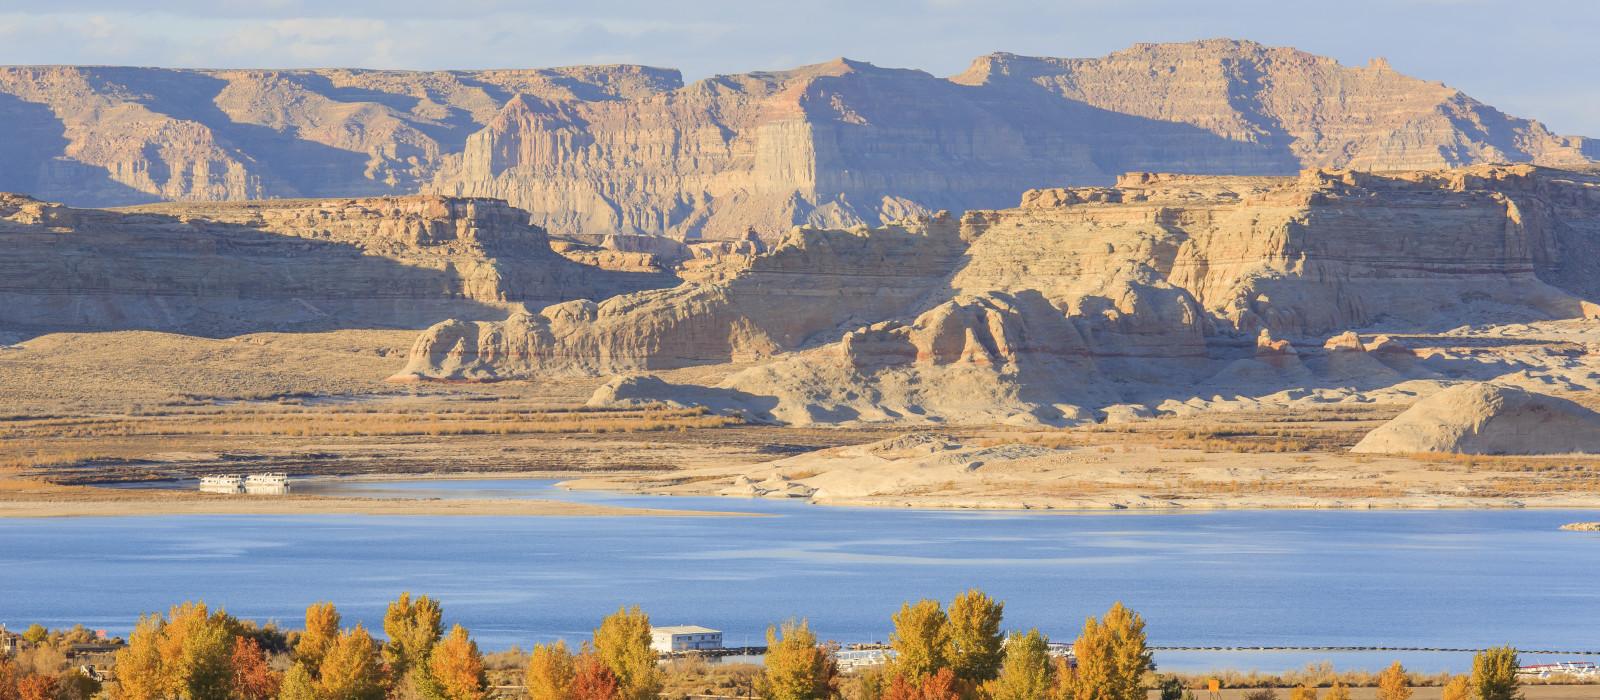 Destination Page, Arizona USA